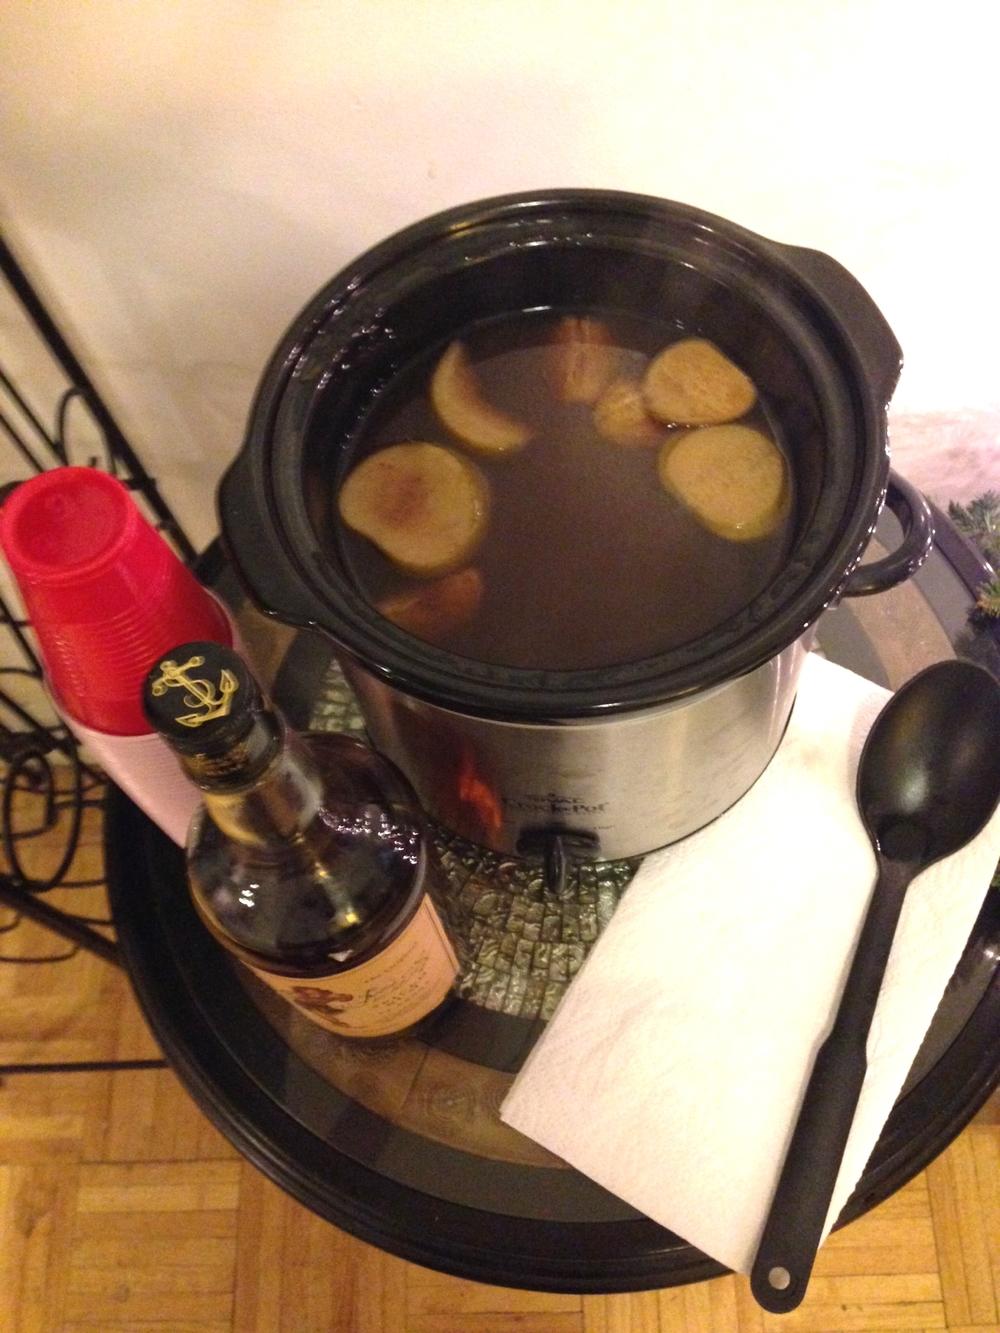 Spiked, Spiced Rum Cider!